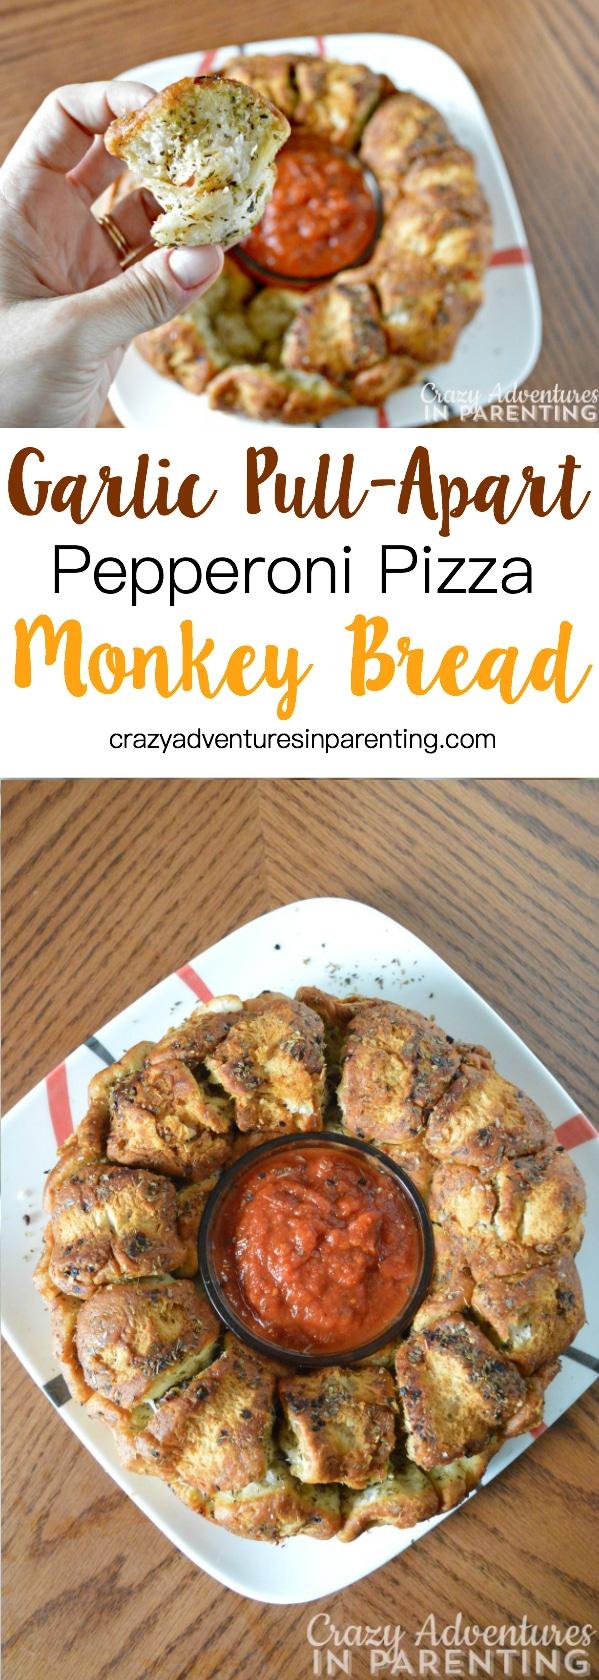 Pizza Pull Apart Monkey Bread